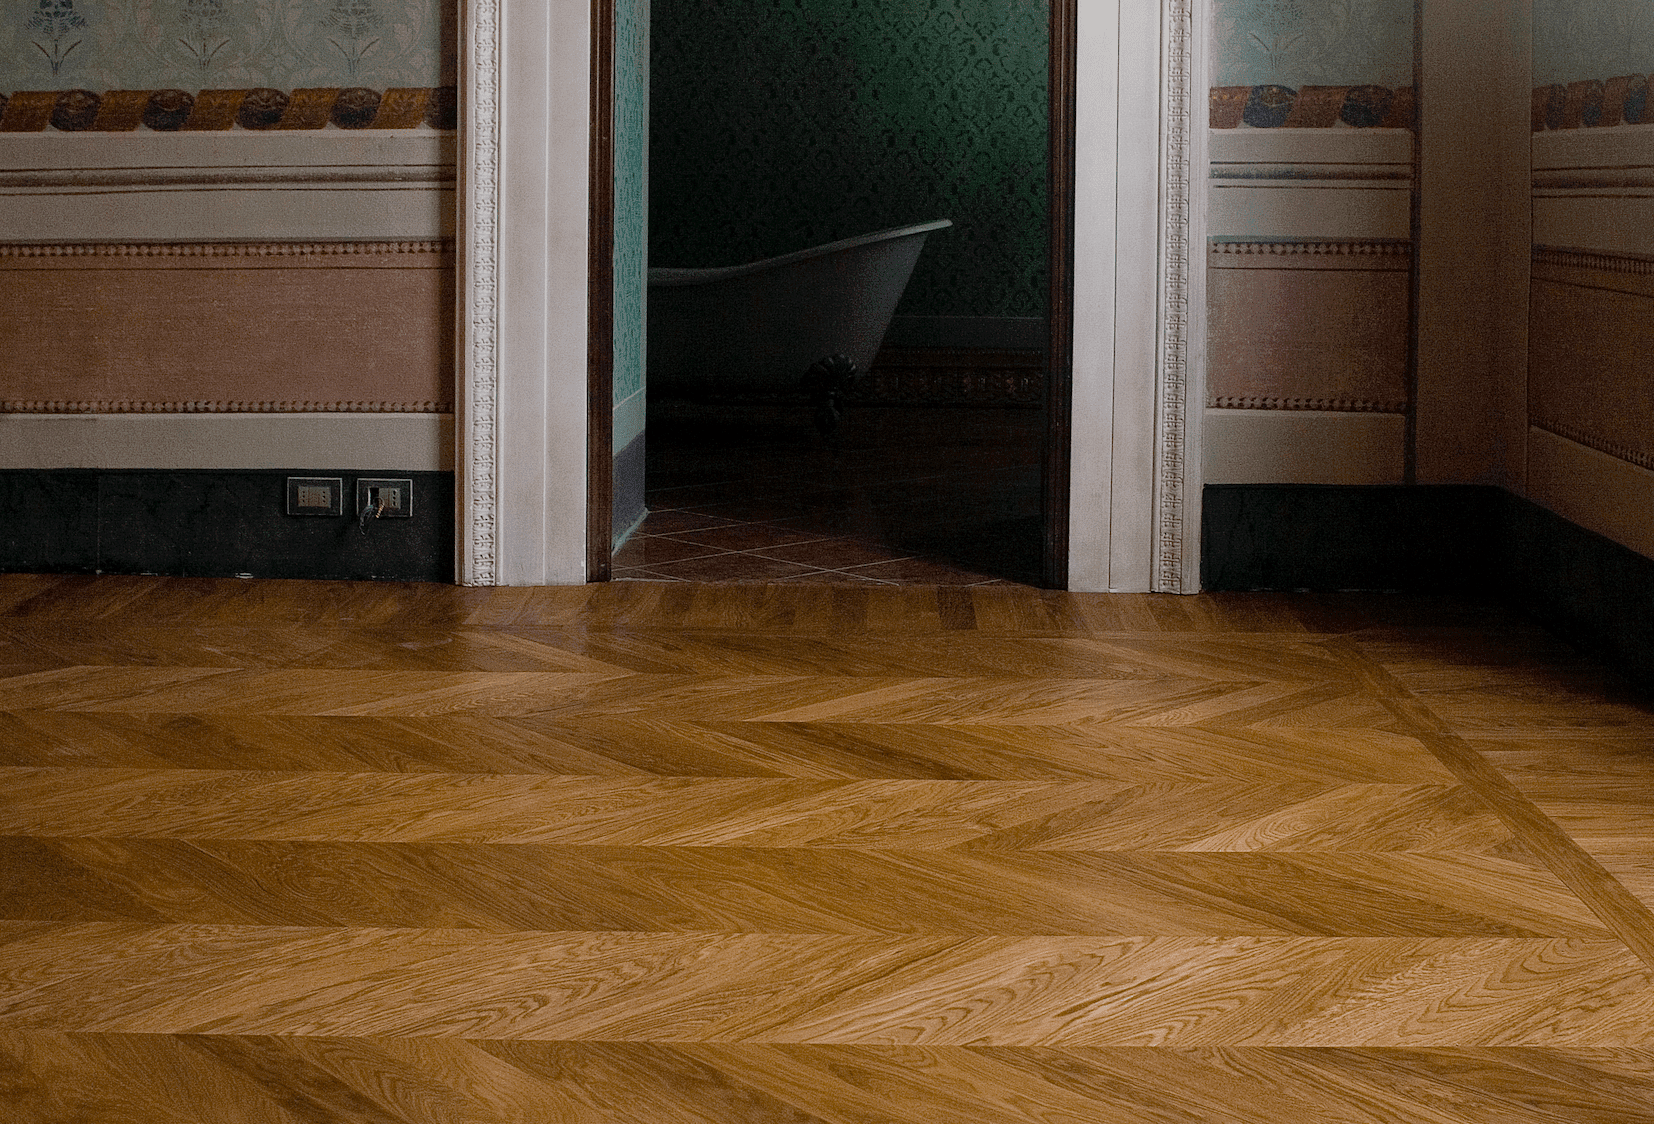 Lina arte Menconi - spina ungherese